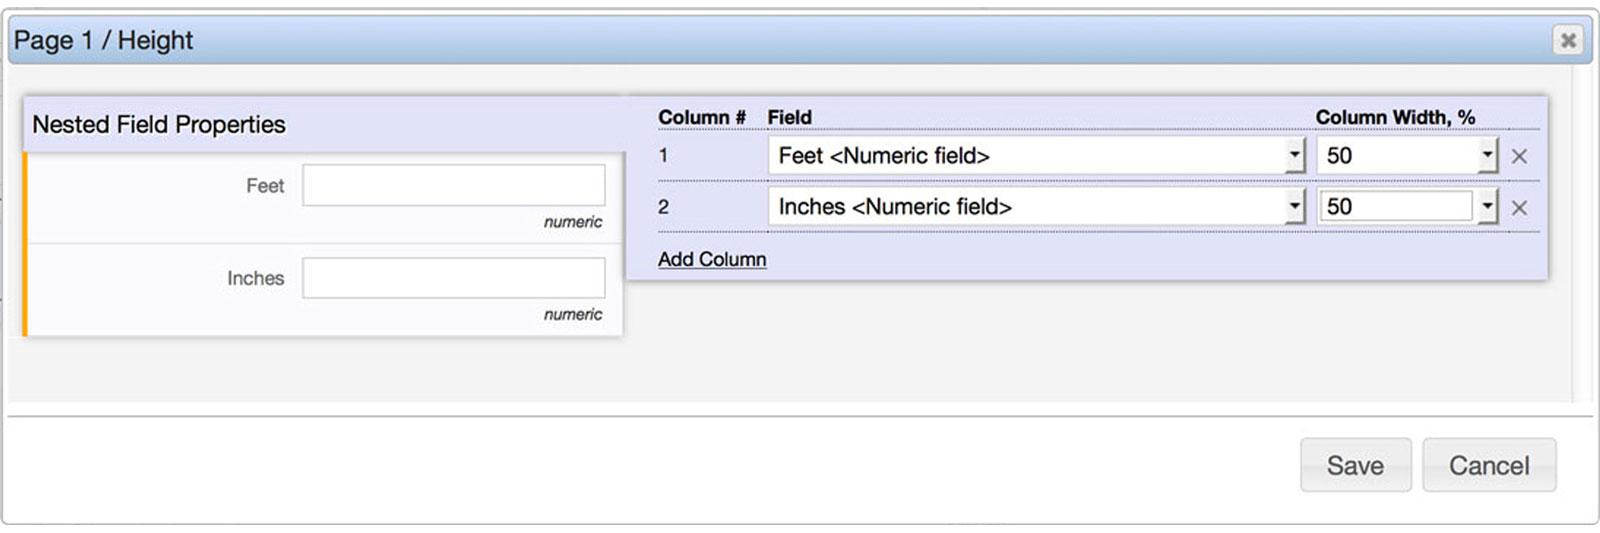 Flowfinity - Display Input Fields Across a Page